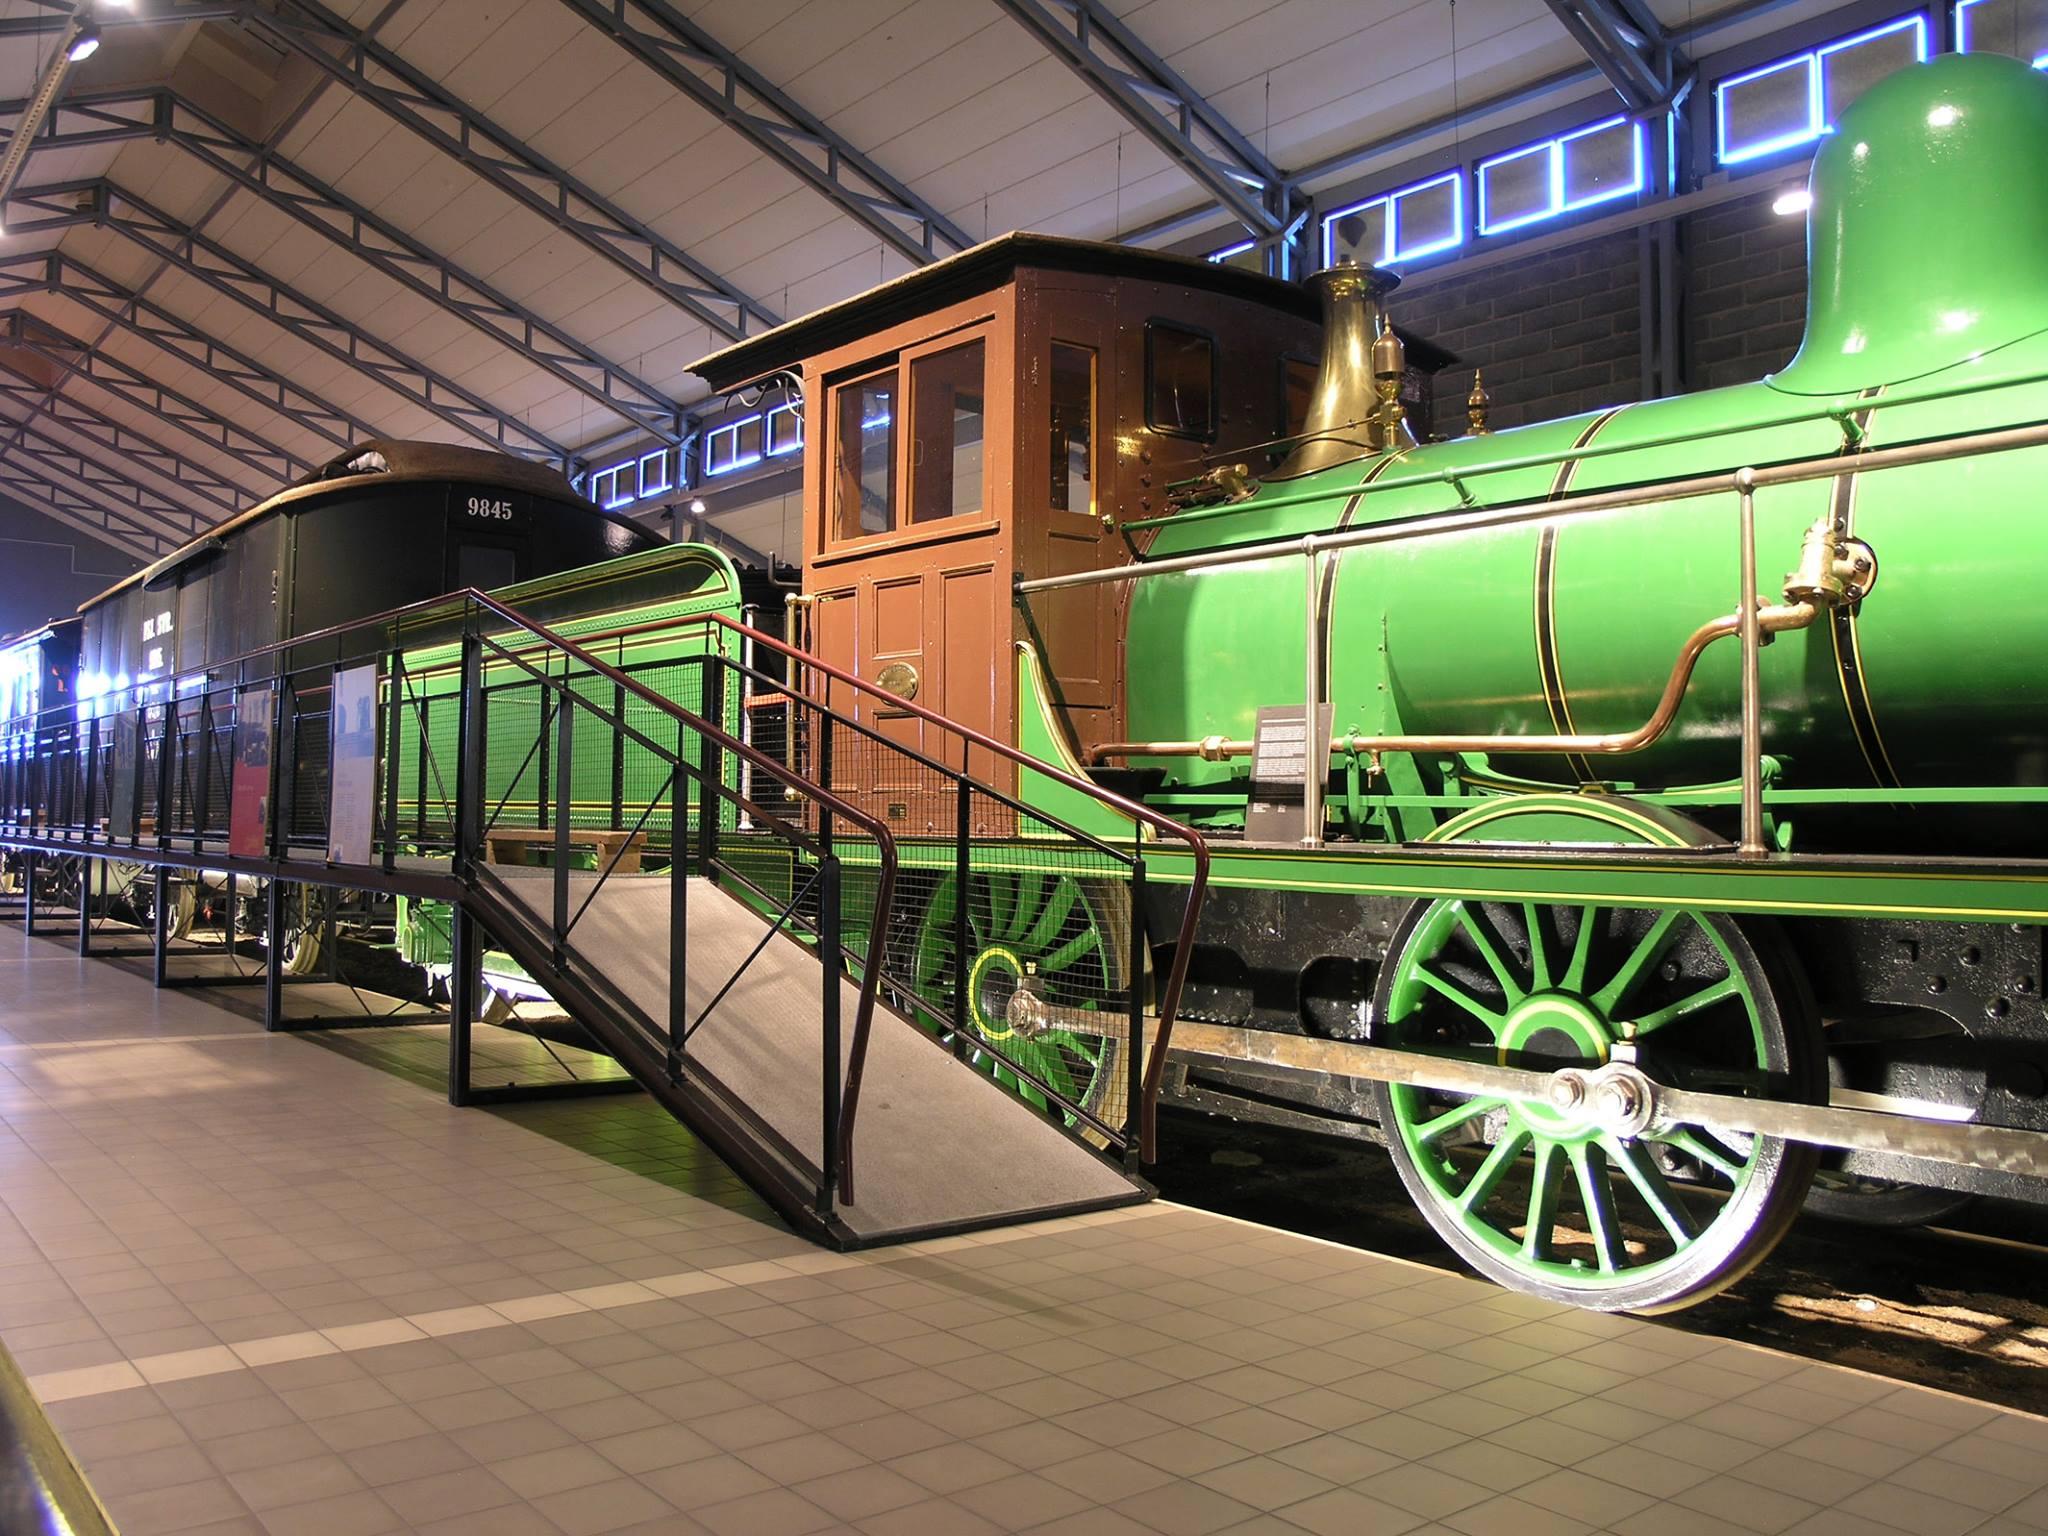 Finnish Railway Museum